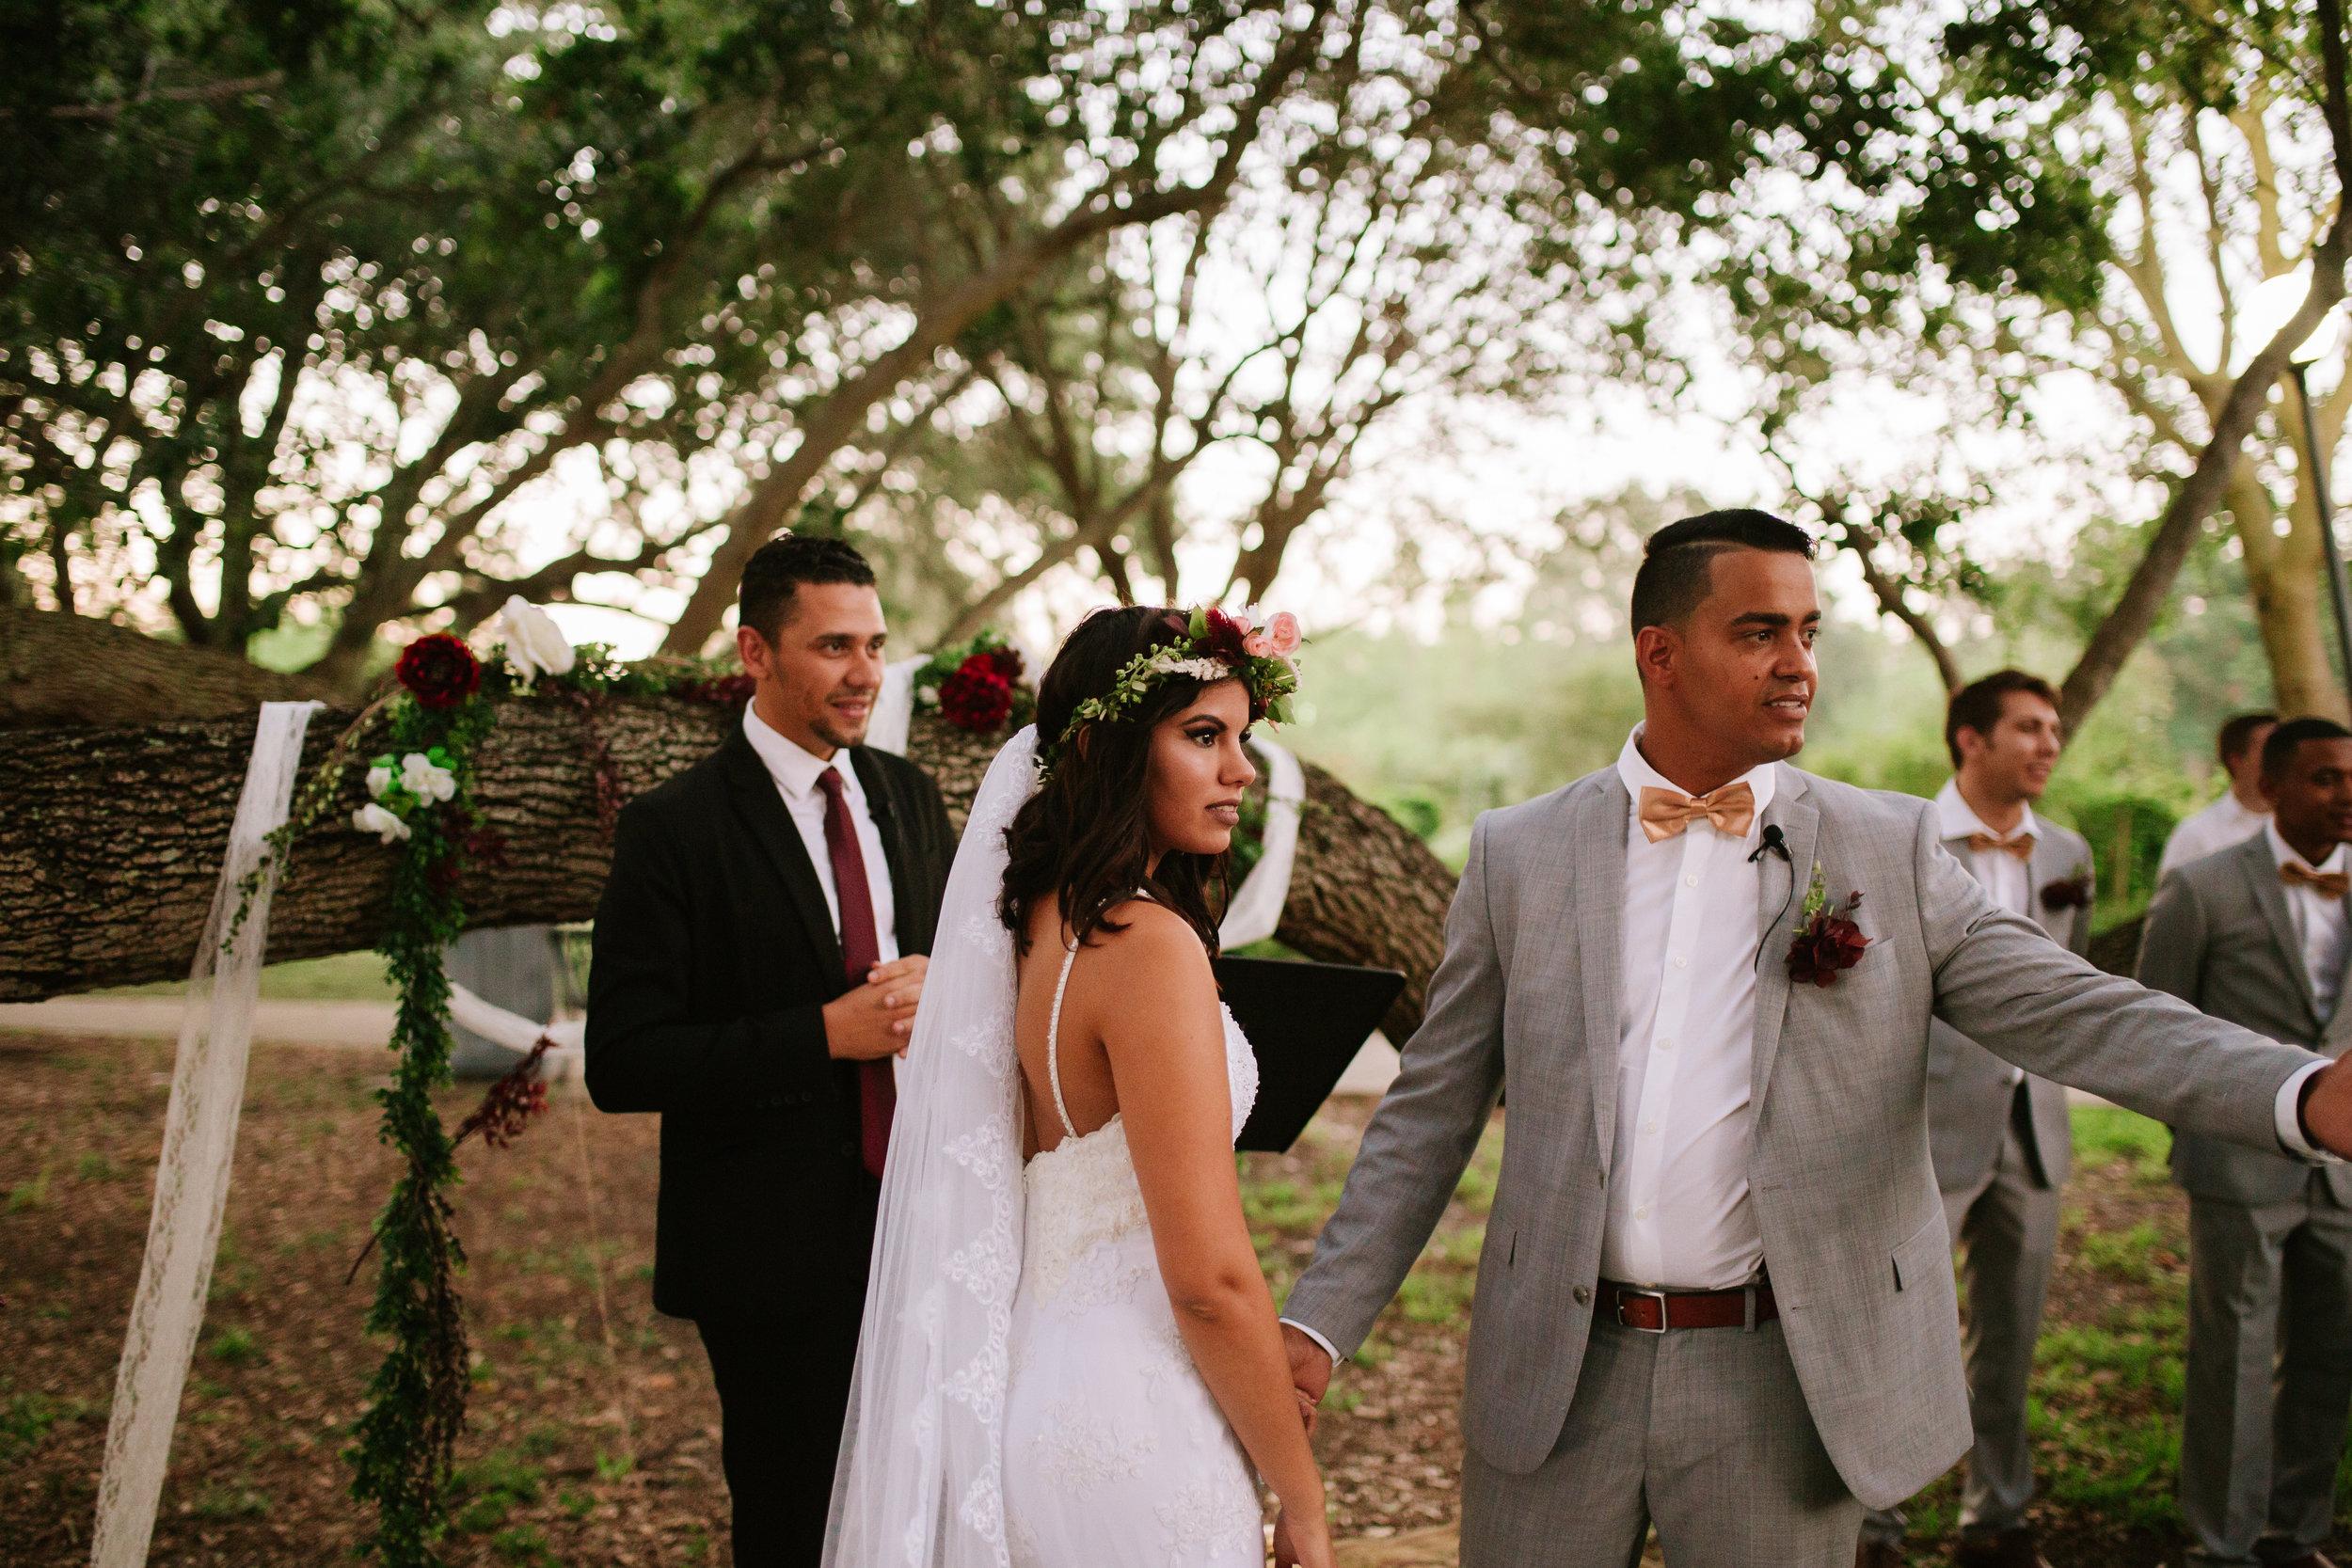 2017.05.23 Barbara and Mauricio Sales Port St Lucie Wedding (416 of 772).jpg